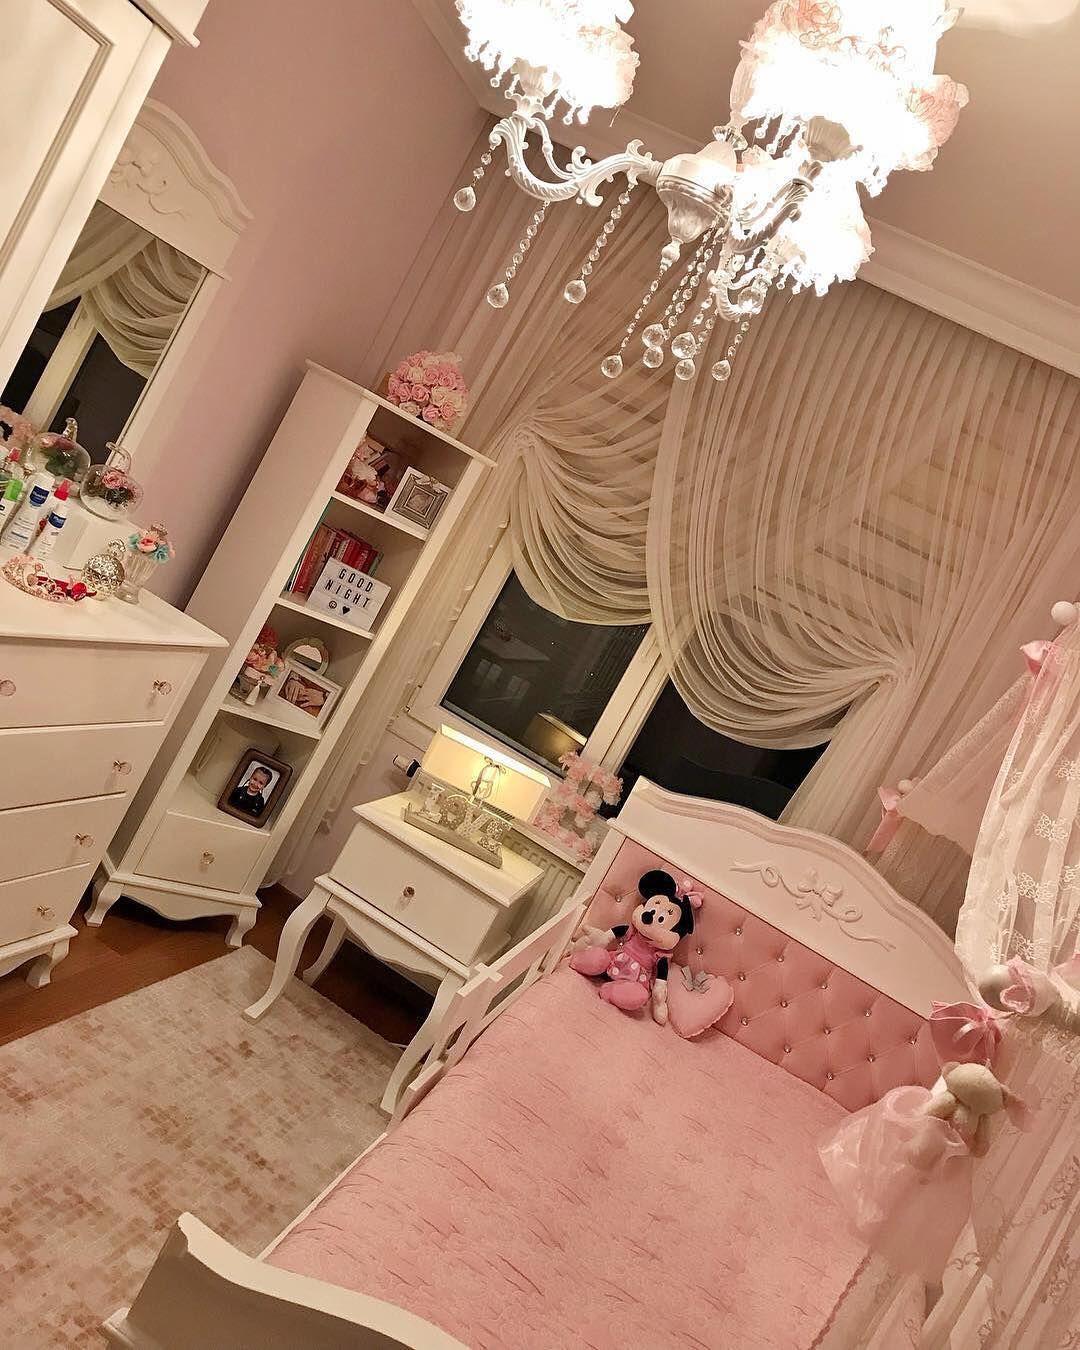 4 537 Likes 45 Comments مجالس مطابخ Decor Decor M M On Instagram تنسيق مميز Sevcinoss ديكور ديكورات Bedroom Colors Decor Home Decor